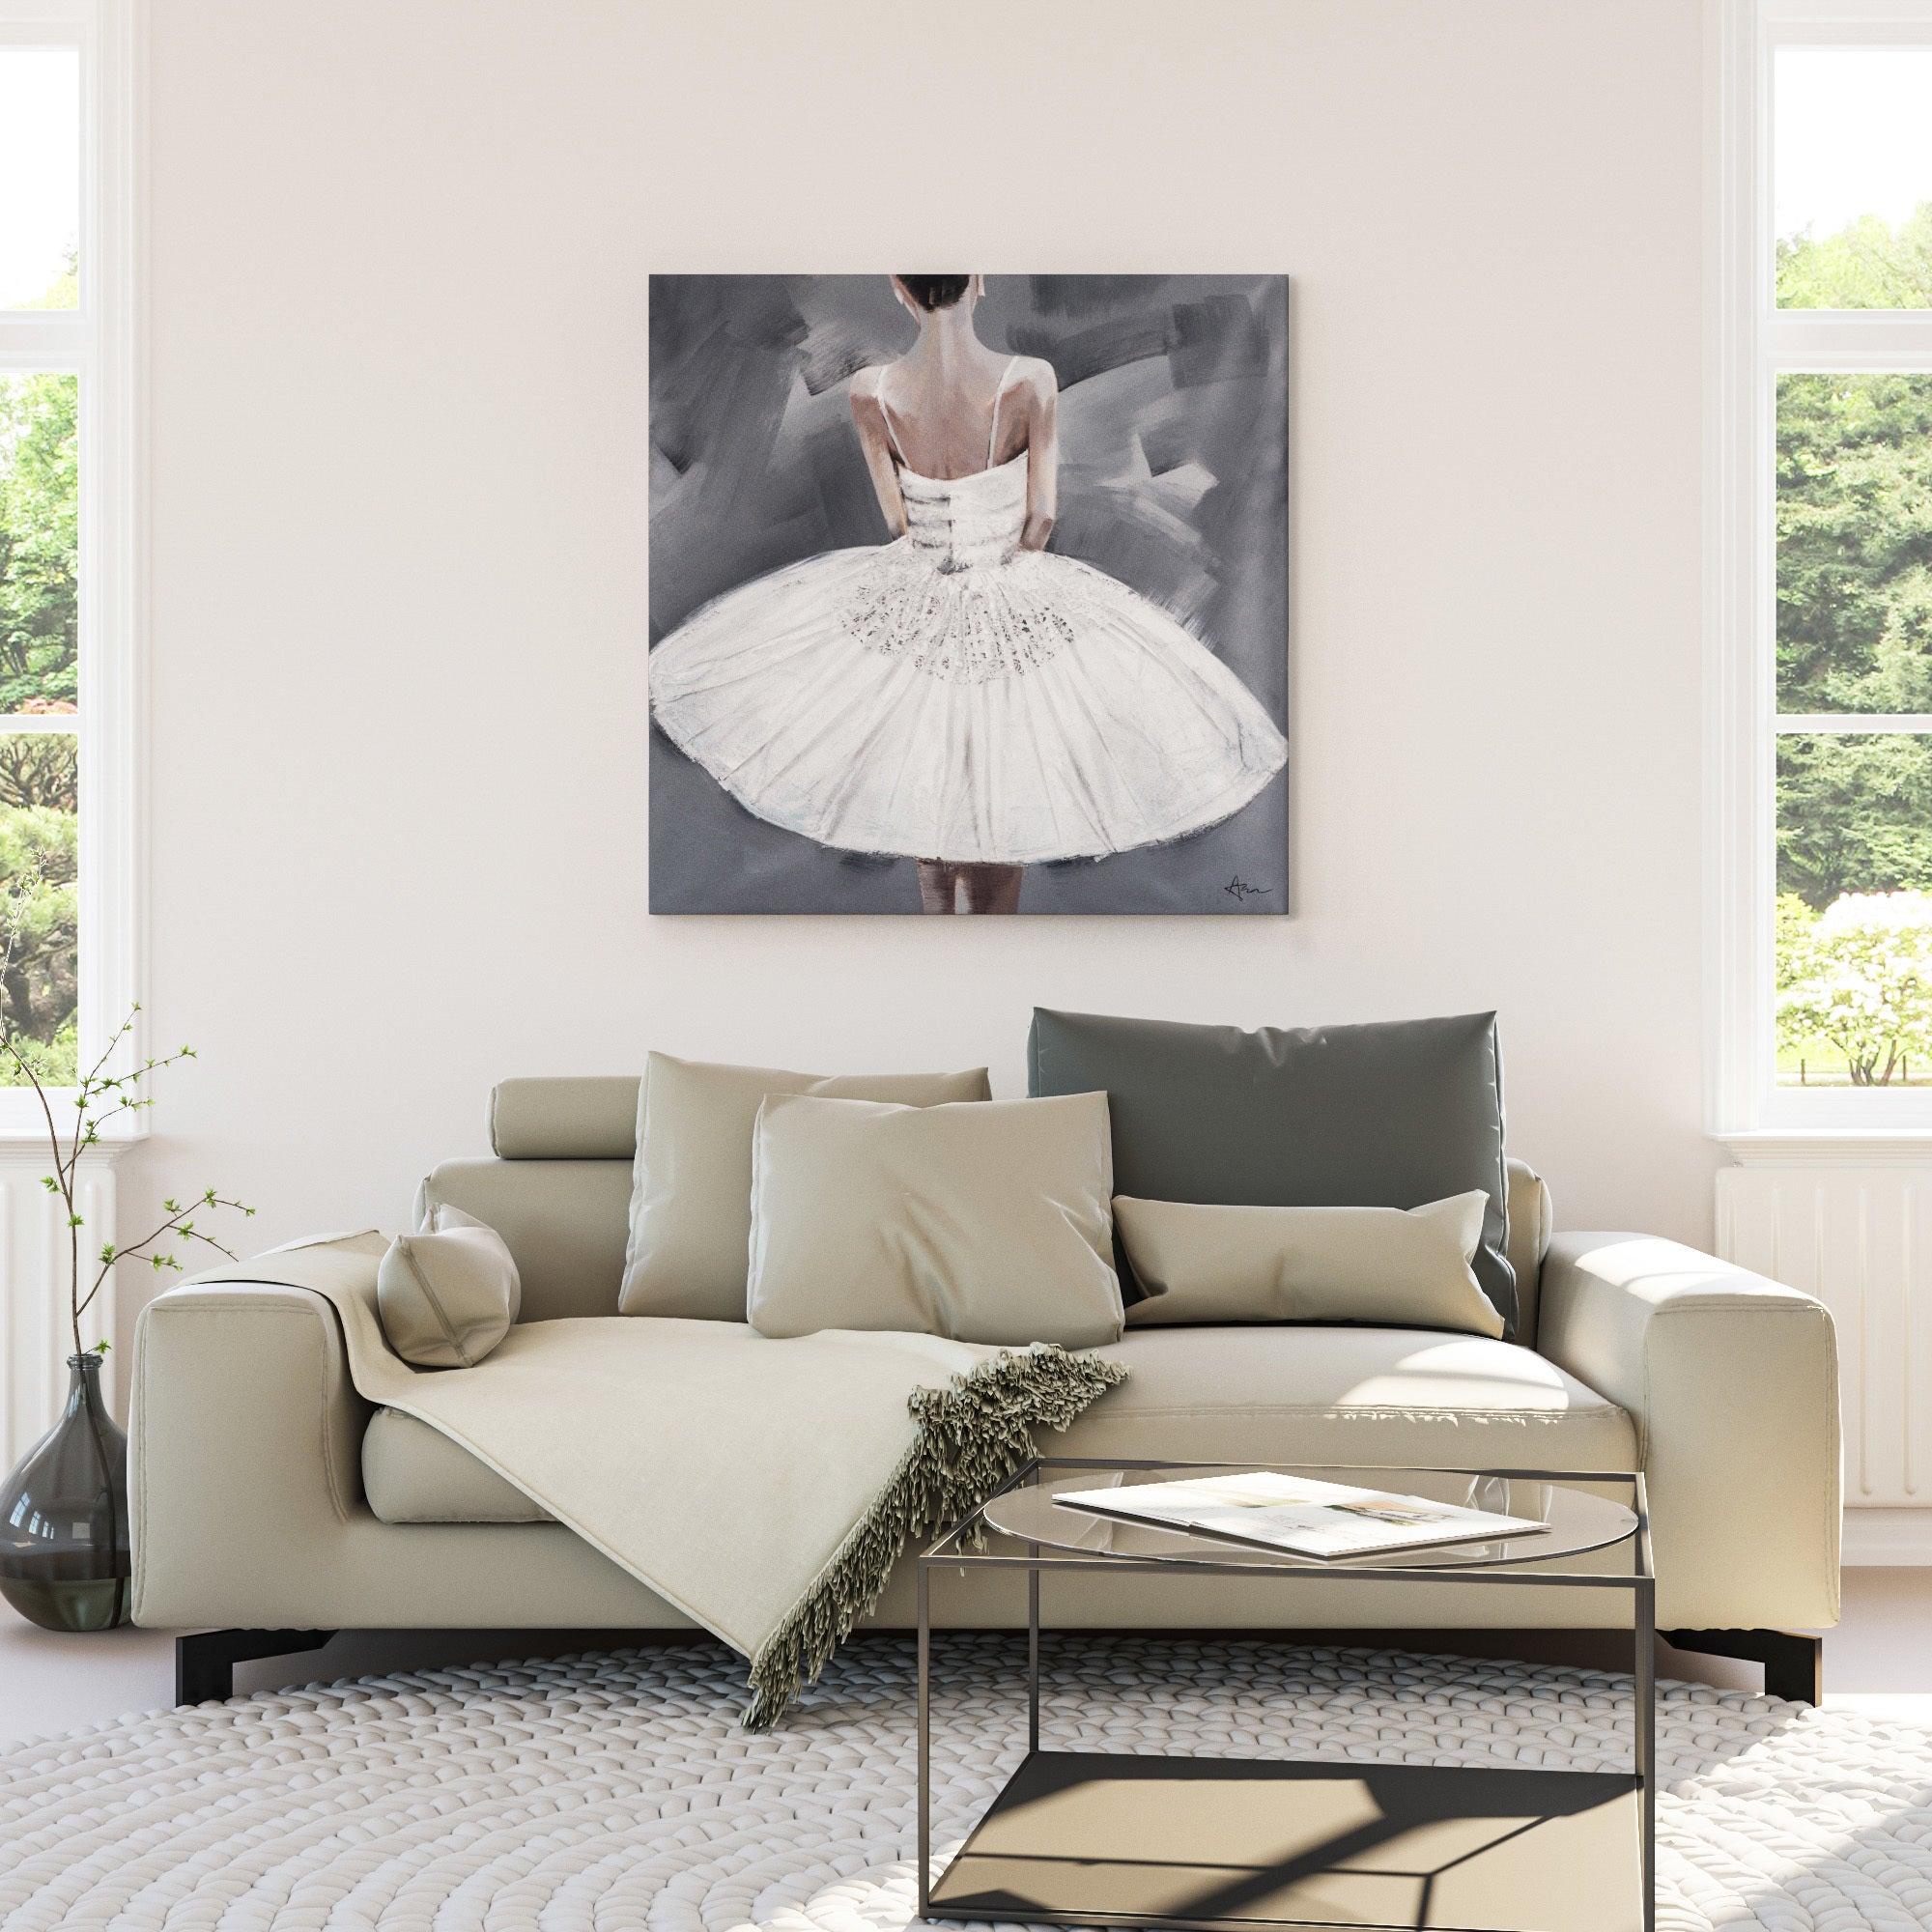 Shop Yosemite Home Decor \'Ballerina III\' Acrylic Square Original ...